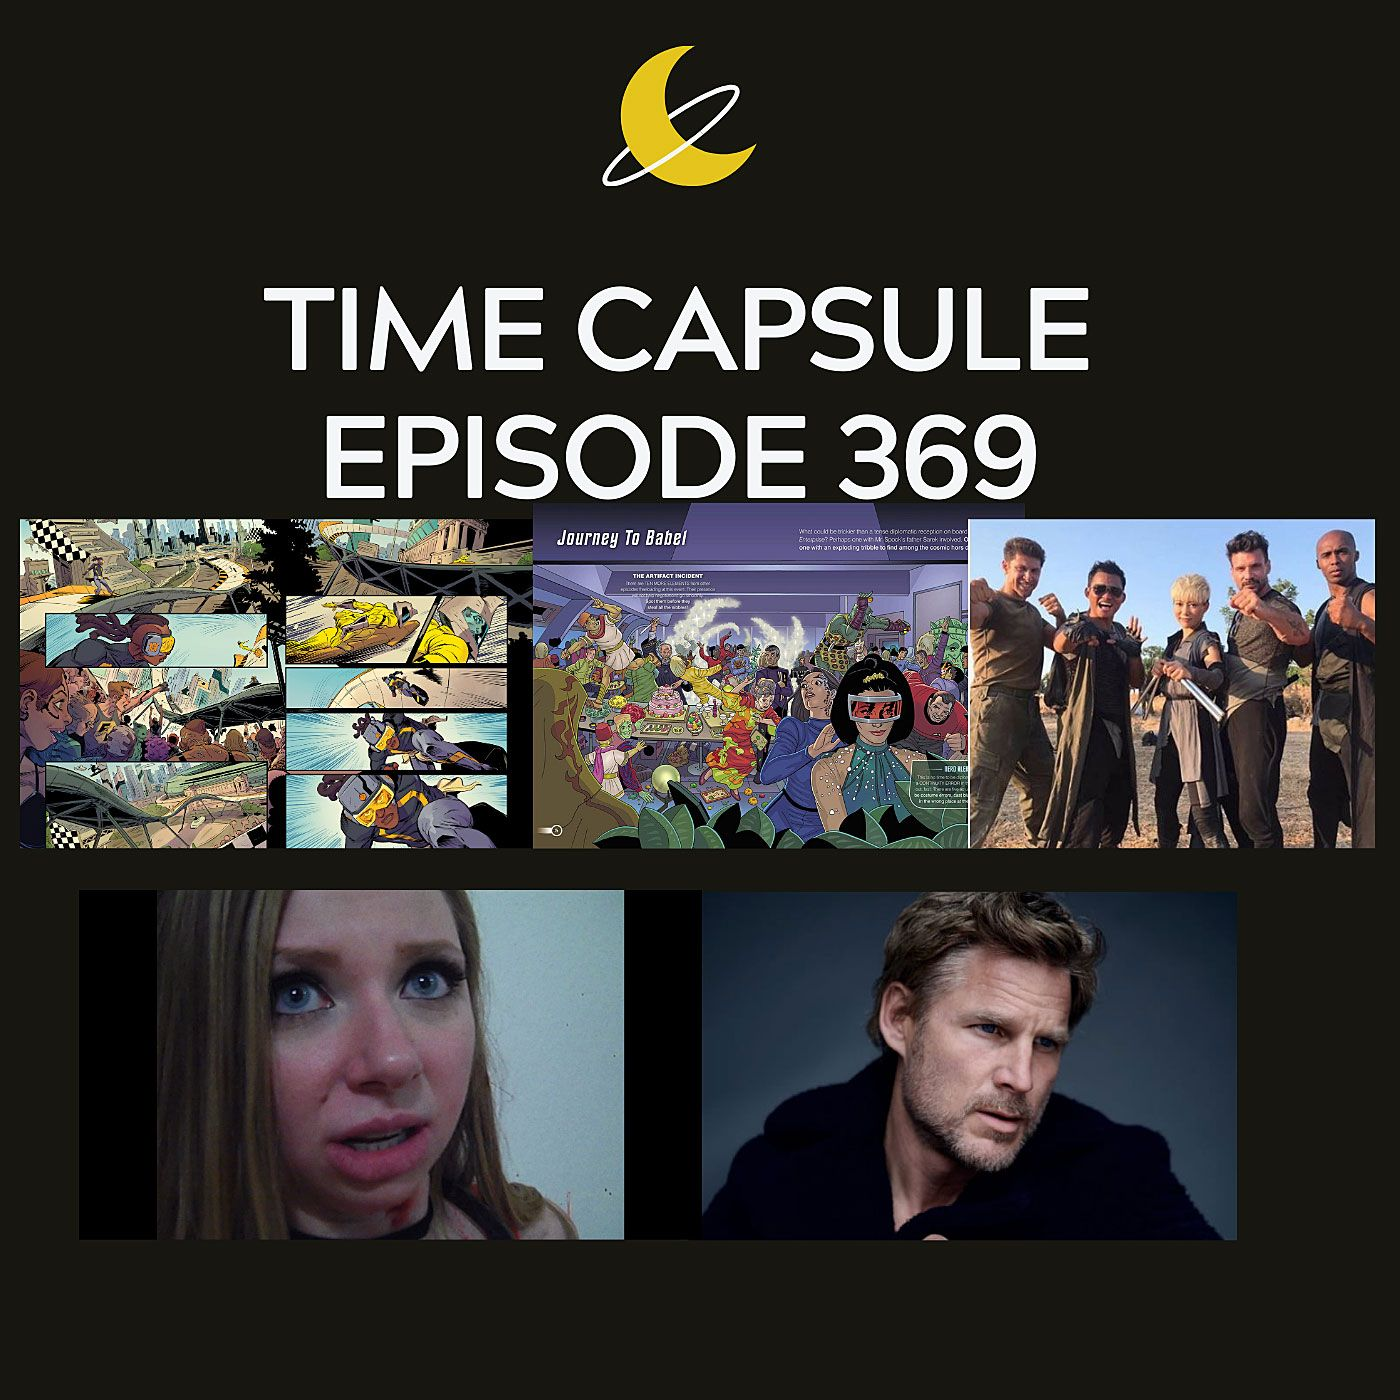 Time Capsule Episode 369